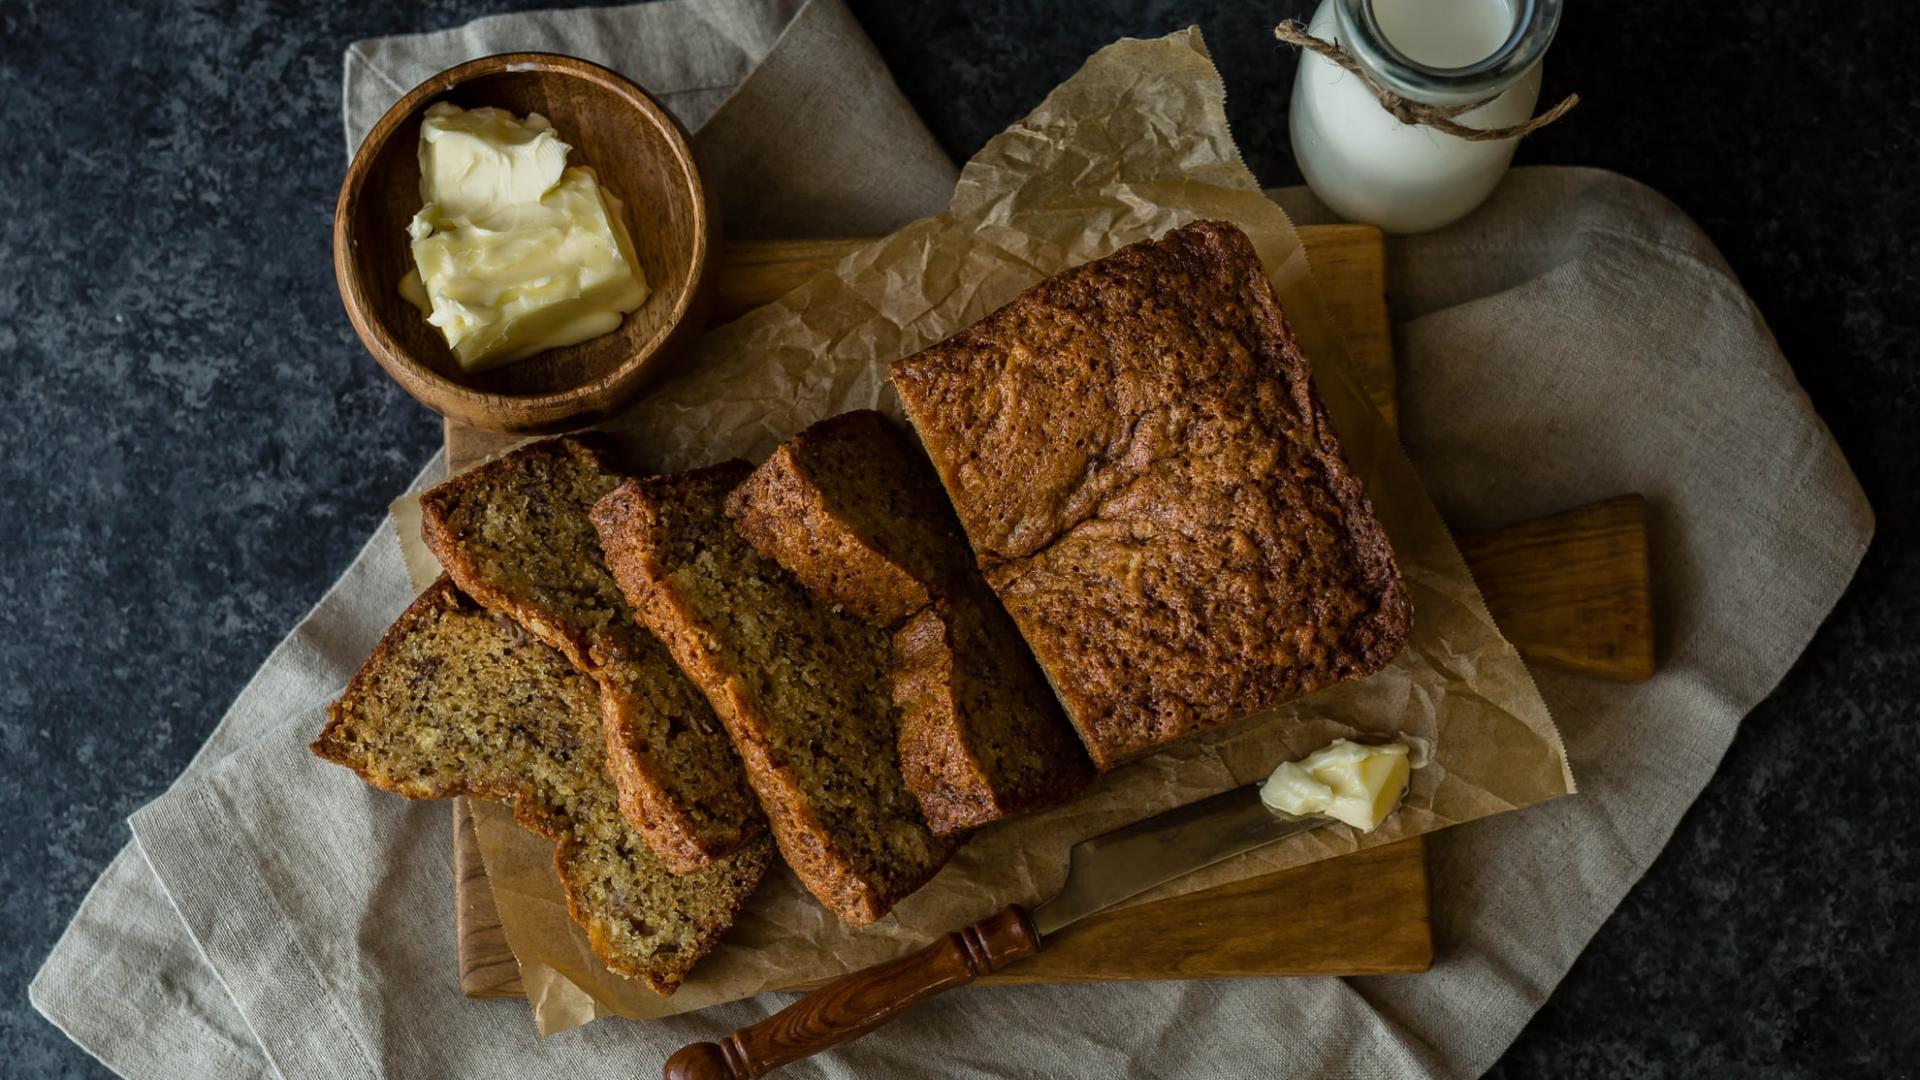 Gesundes Brot - 9 Alternativen zu Weizenbrot